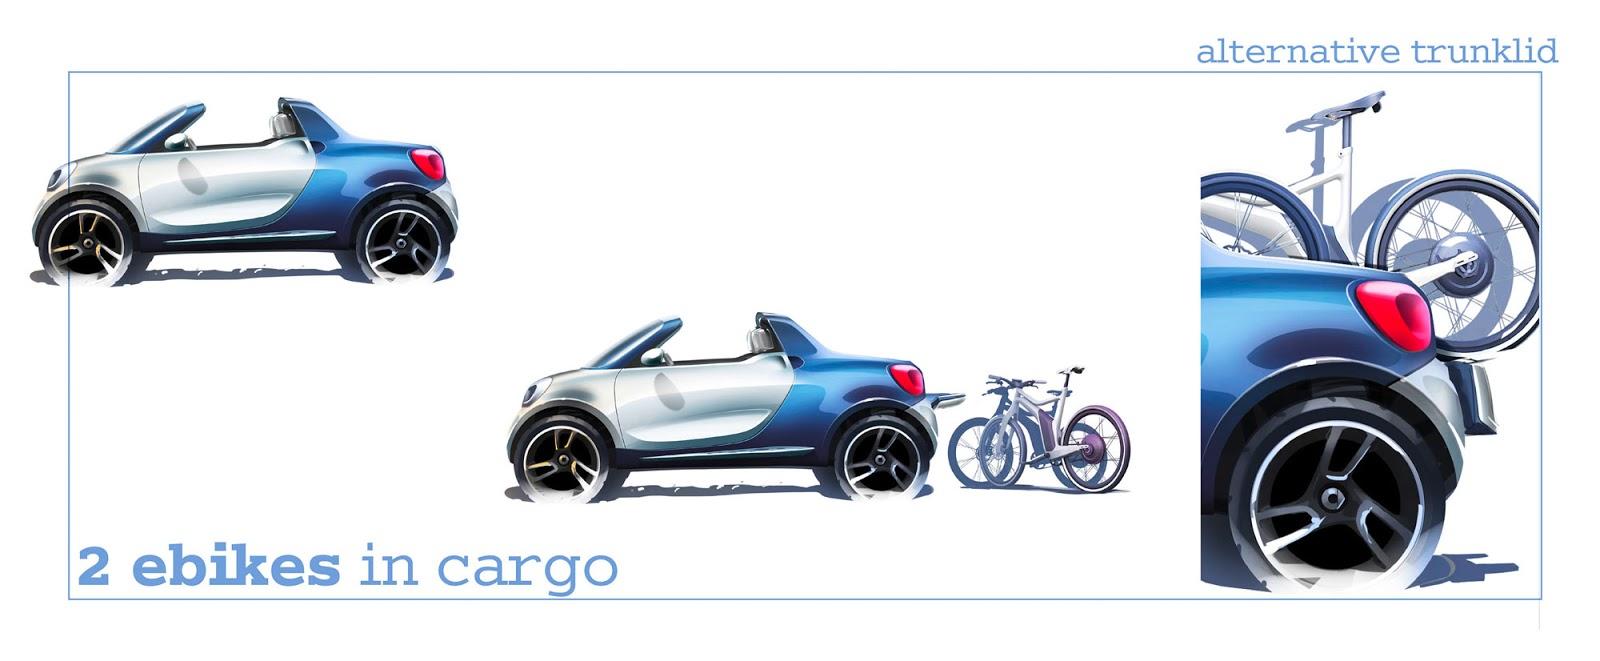 Smart for-us concept sketch by Diedrik Vanbrabant